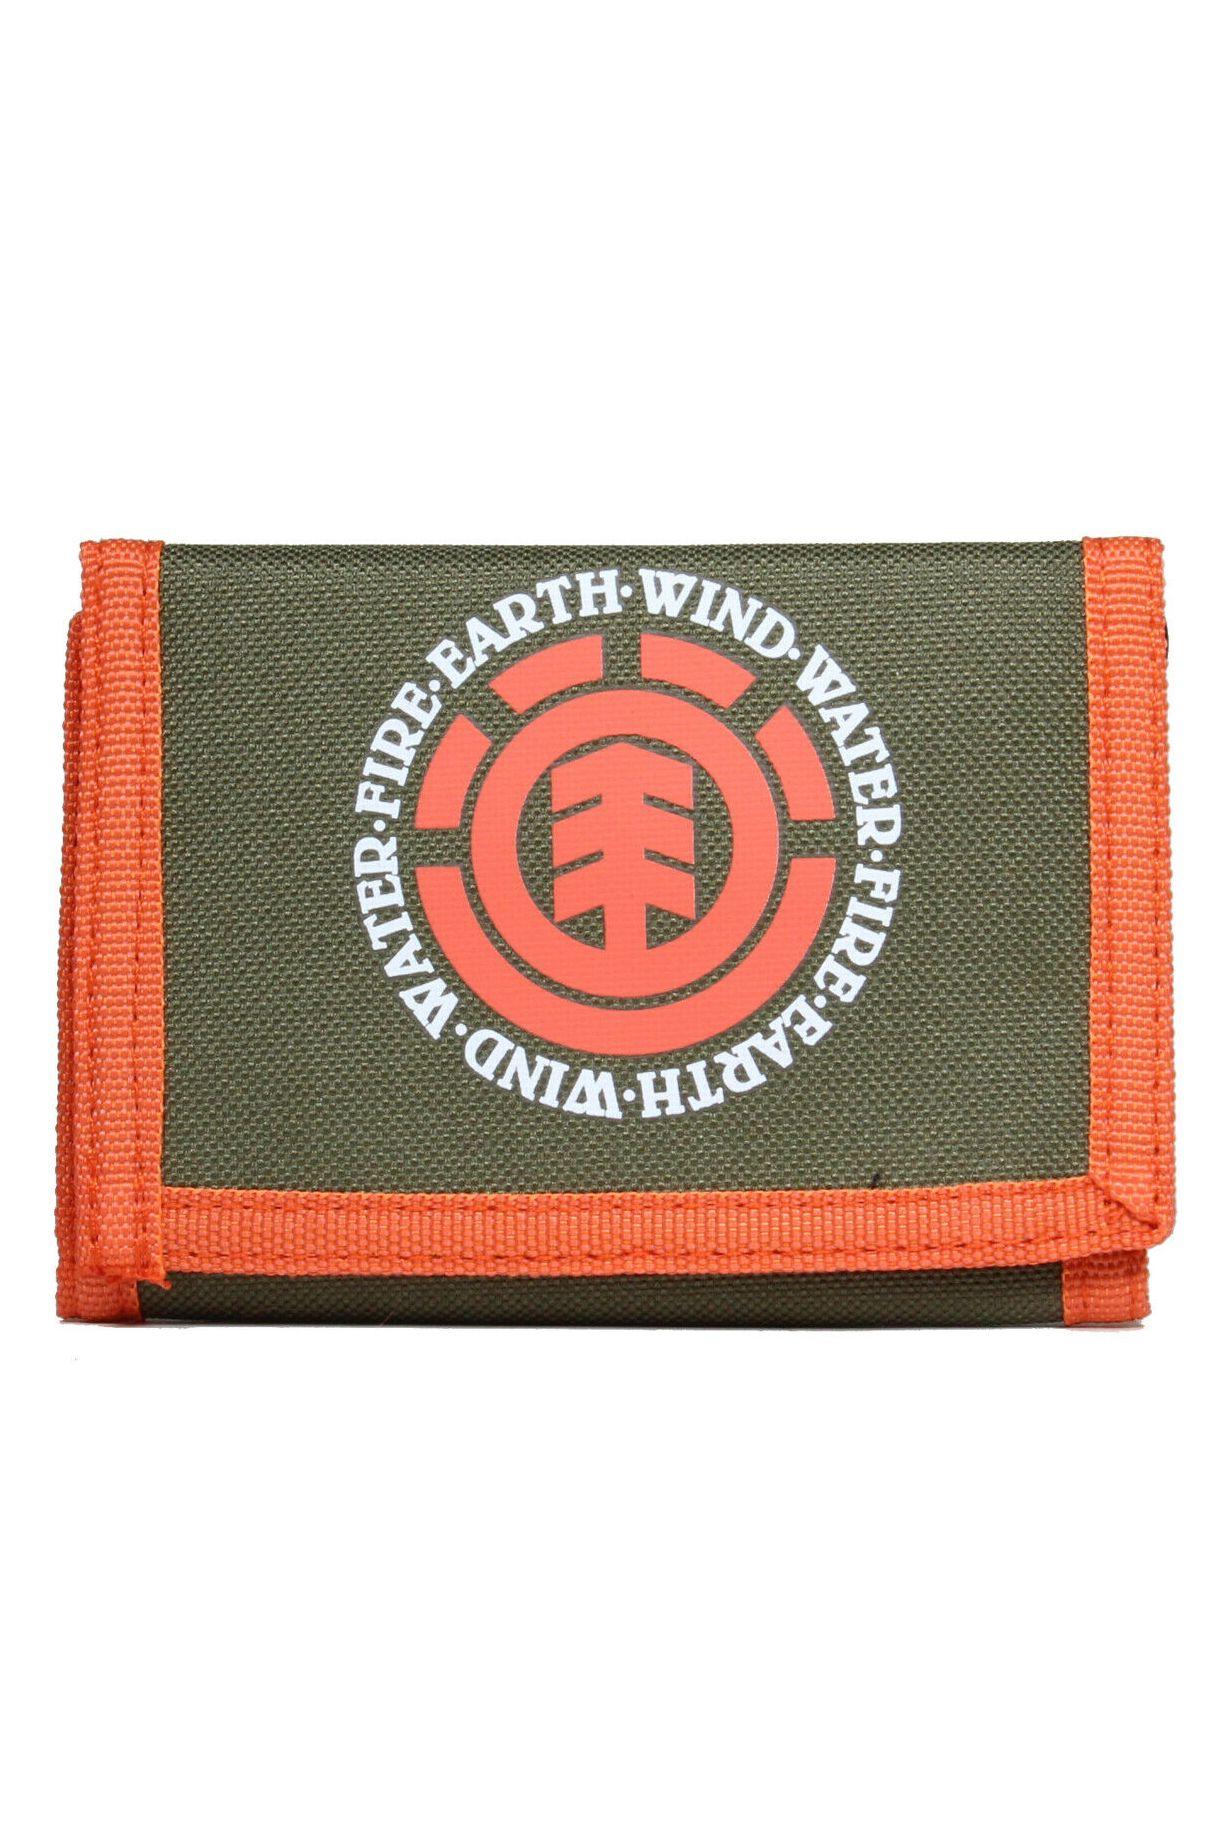 Carteira Element ELEMENTAL WALLET PACK Army